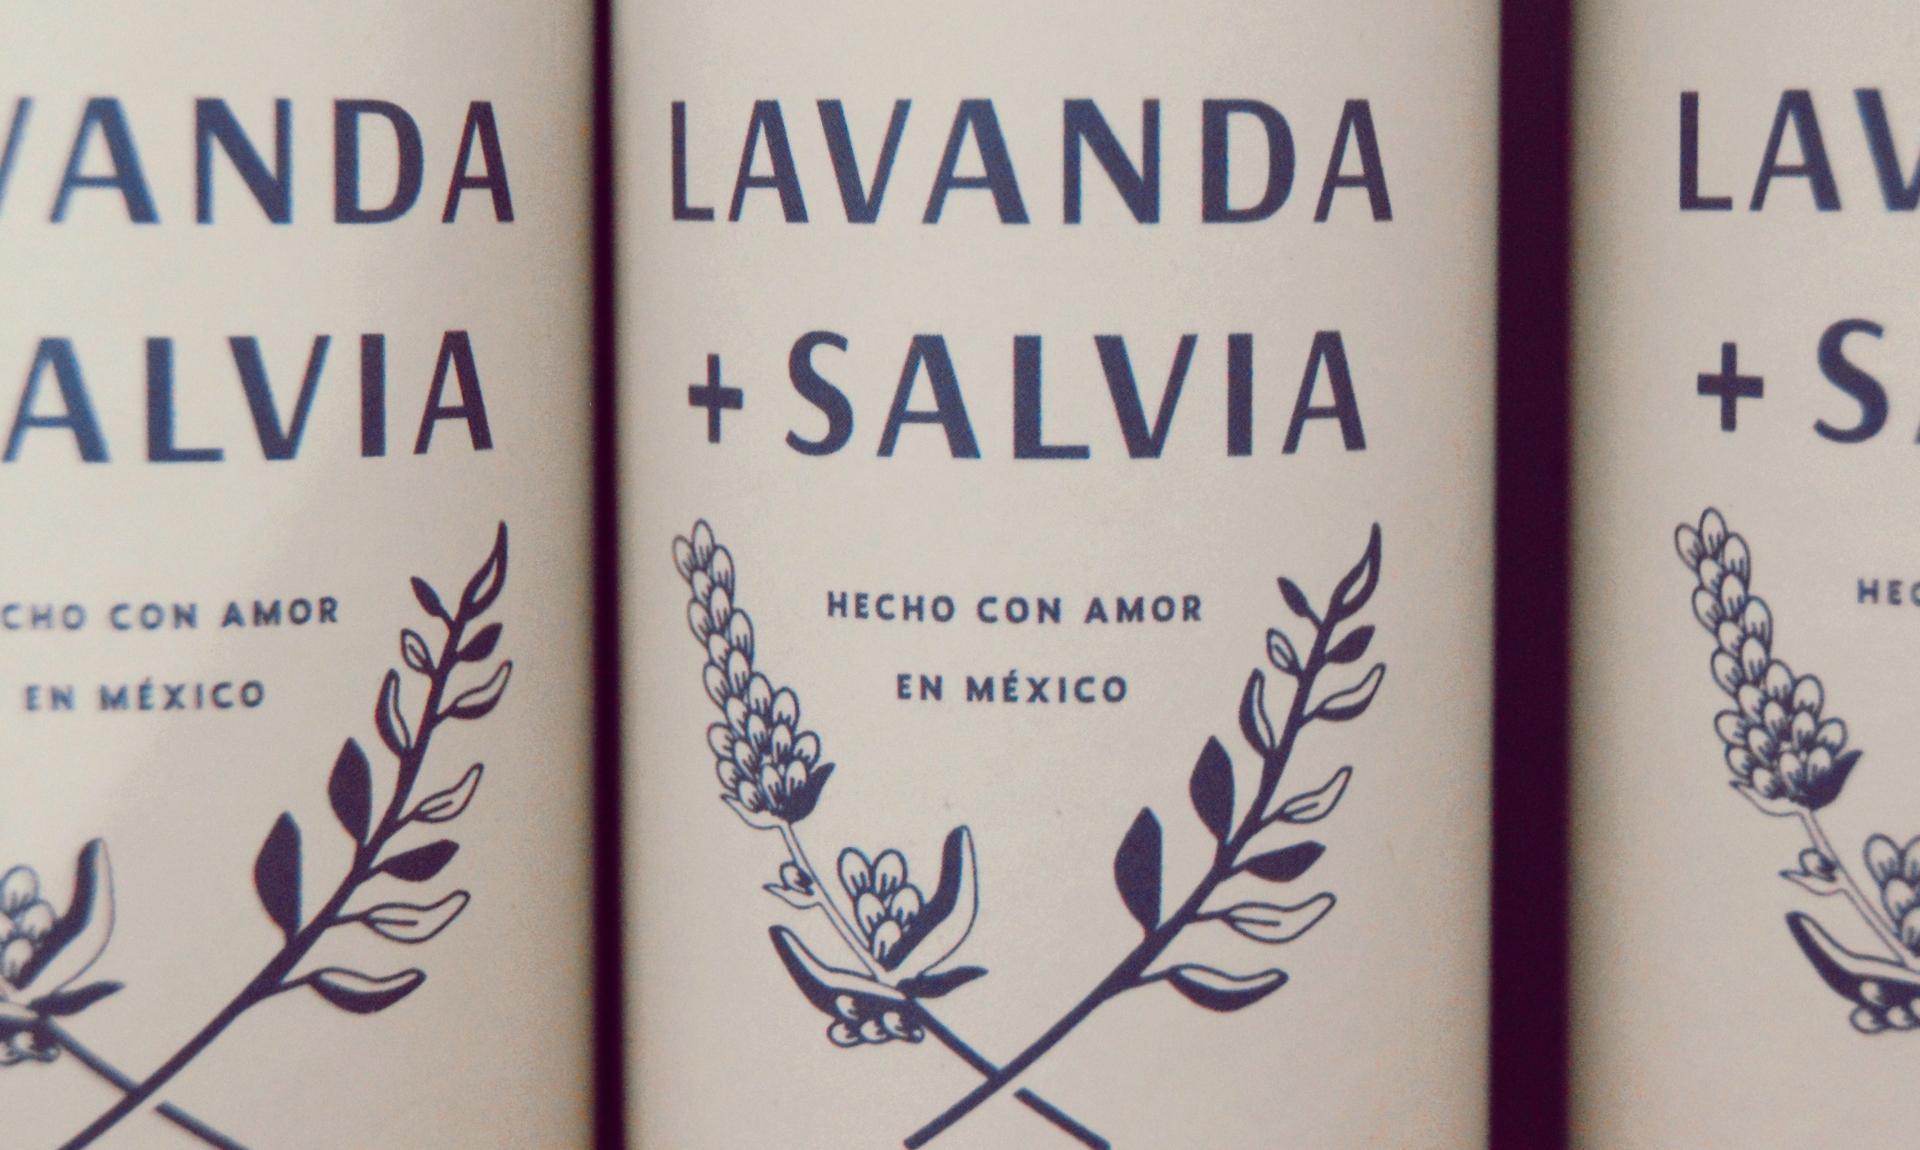 cacau-zeki-michael-design-cedro-cipres-design-packaging-studio-branding-mexico-international-freelance-young-lavanda-illustration.jpg